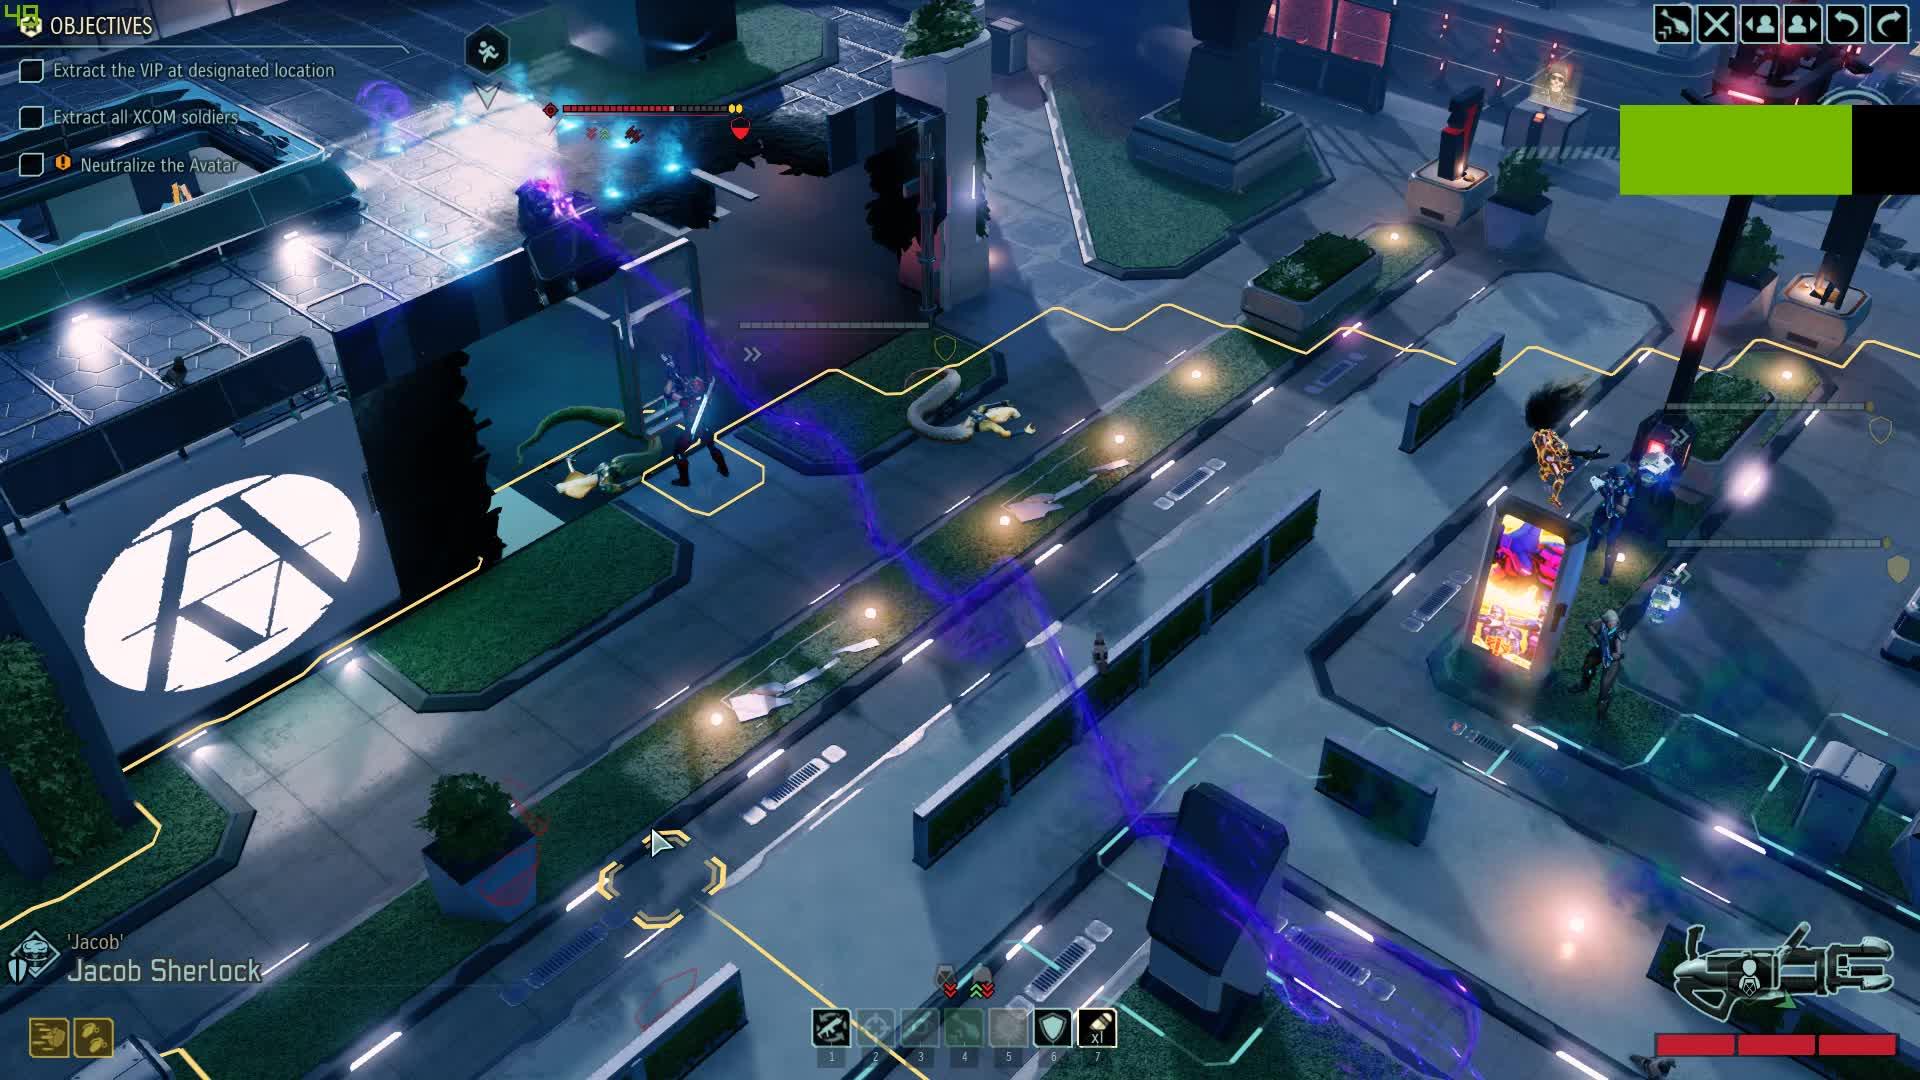 XCOM 2 2018.05.07 - 10.09.03.04 GIFs